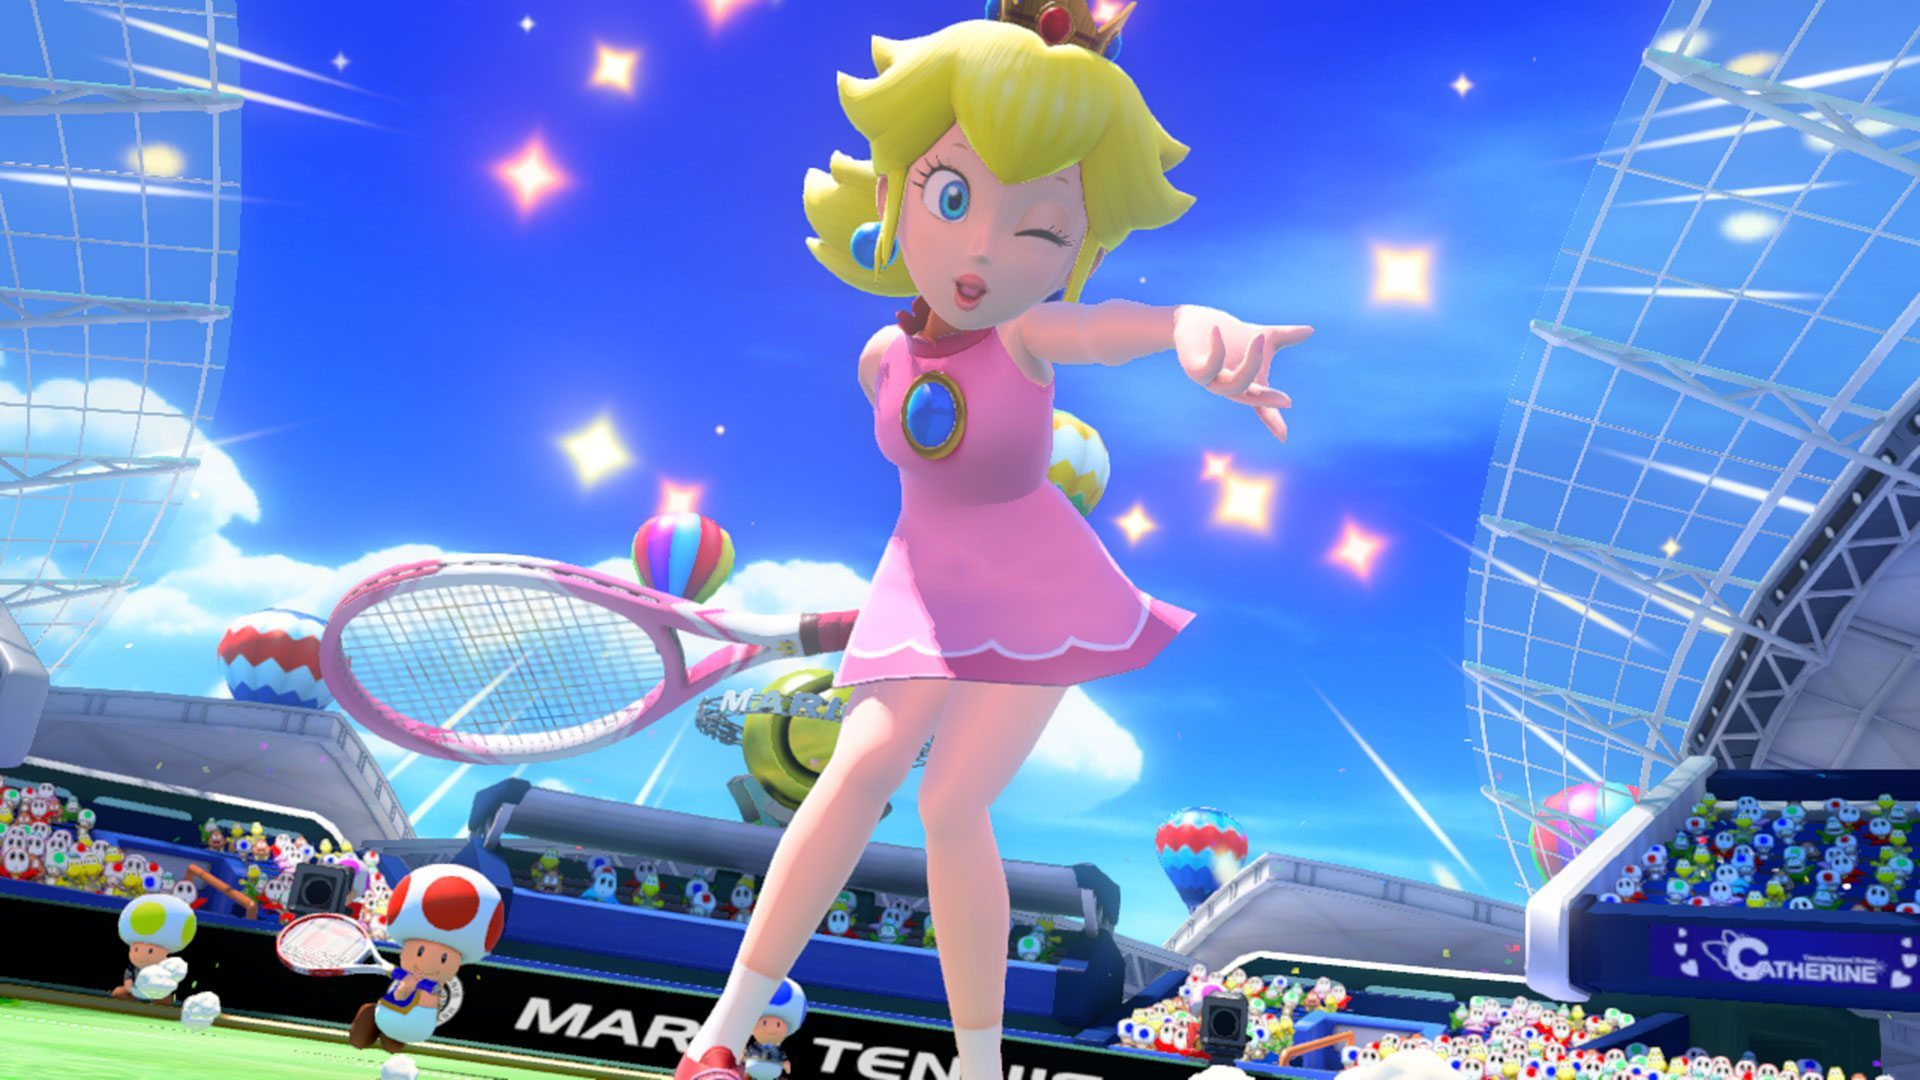 peach-mario-tennis-ultra-smash-gameplay-screenshot-peachys-got-it-wii-u